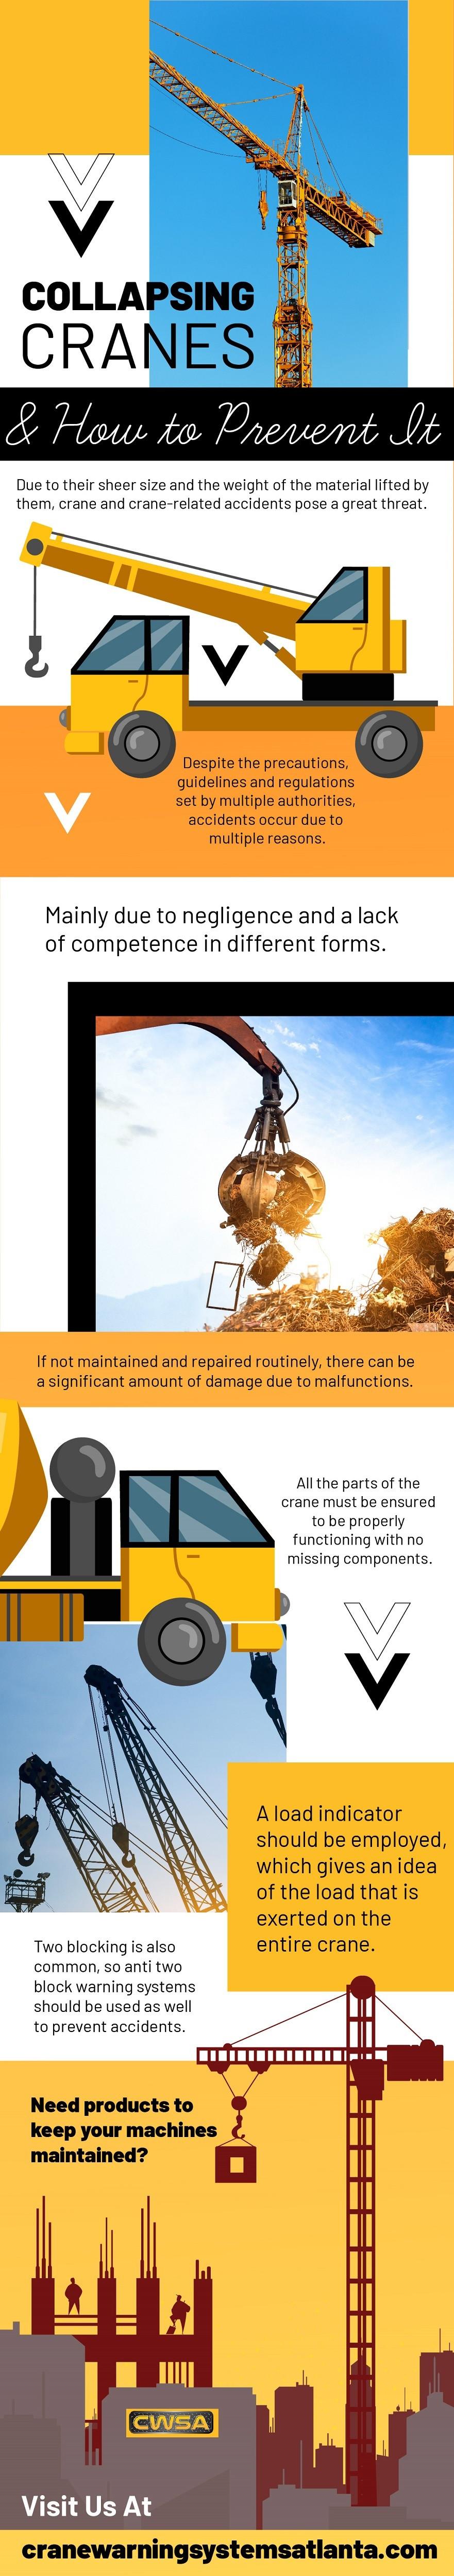 https://www.cranewarningsystemsatlanta.com/raycowylie